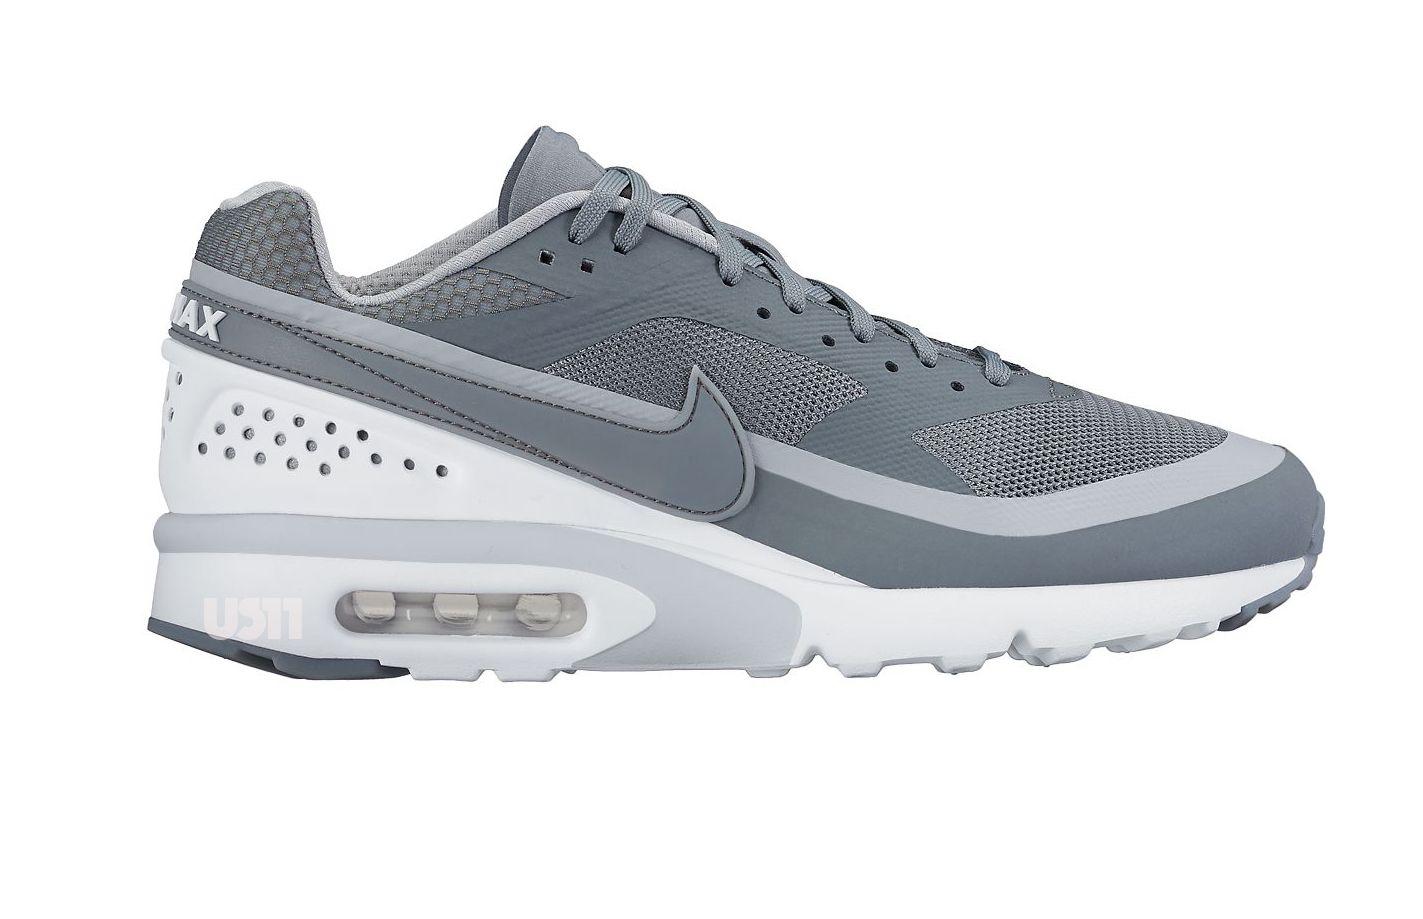 259652a34273 Nike Air Max BW Ultra  Two Upcoming Colorways - EU Kicks  Sneaker Magazine